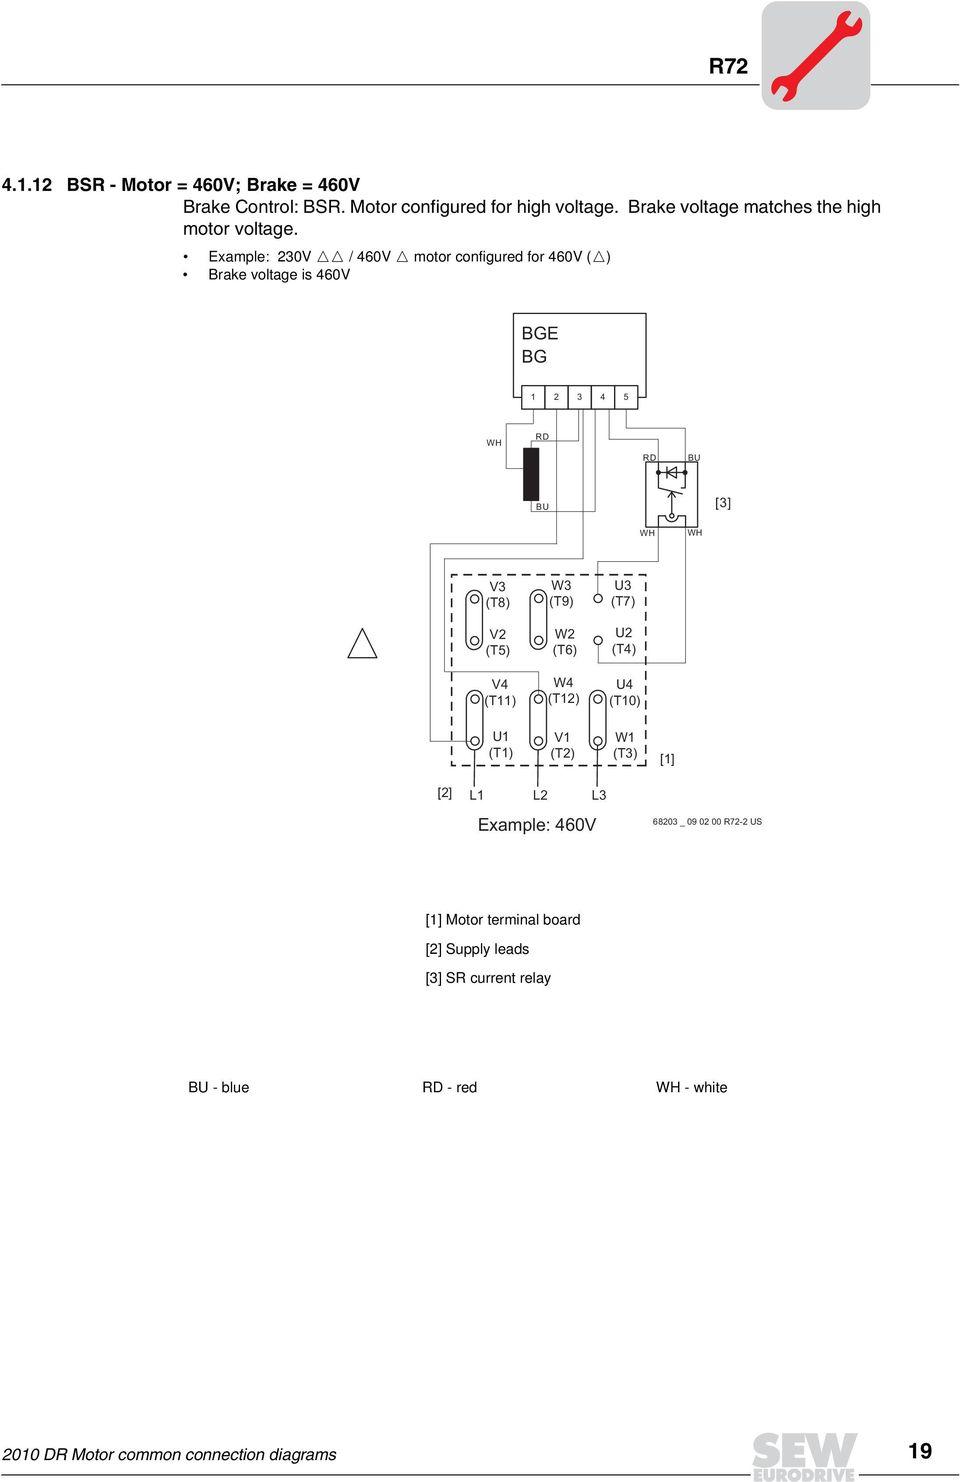 medium resolution of example 230v 460v motor configured for 460v brake voltage is 460v v3